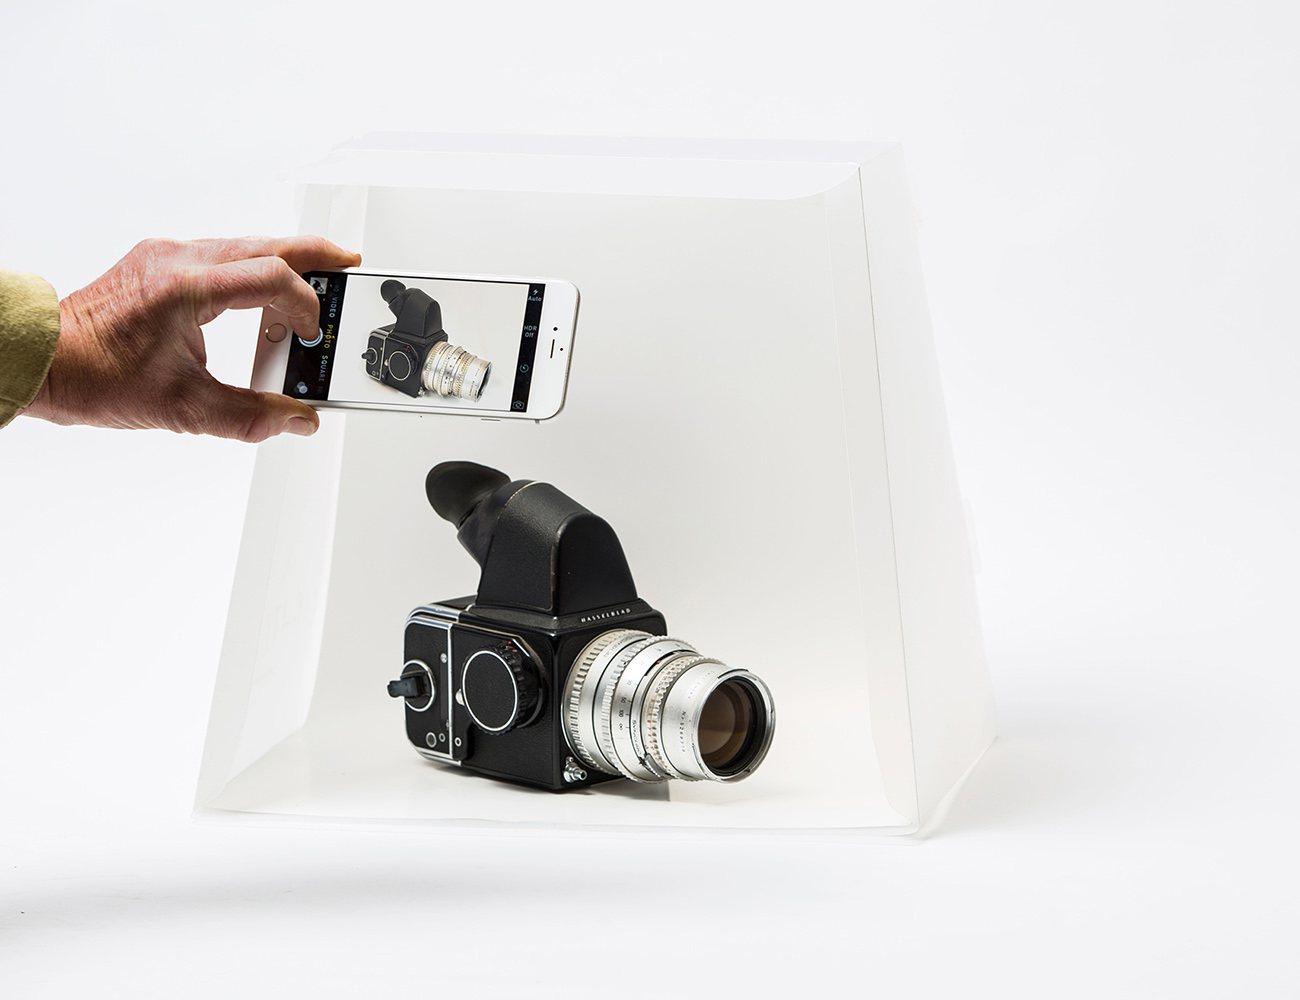 LightcasePro Photo Studio for you Smartphone or DSLR